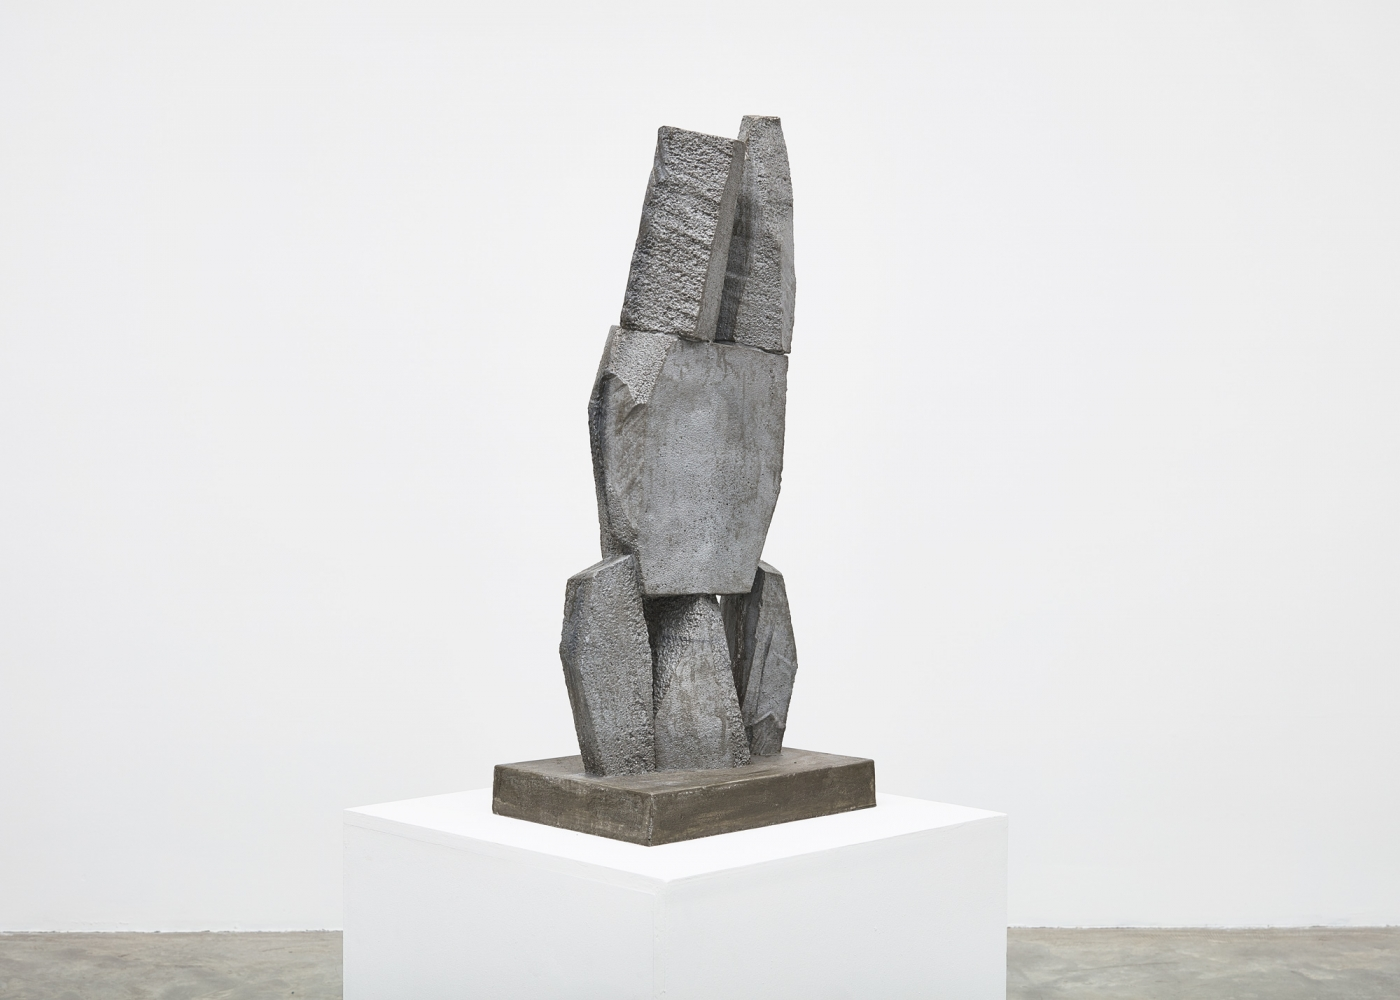 Gimhongsok (b. 1964) Resist - Ho, 2018 High-strength grout cement 36.42 x 15.75 x 11.81 inches 92.5 x 40 x 30 cm Edition 1/3, 2AP